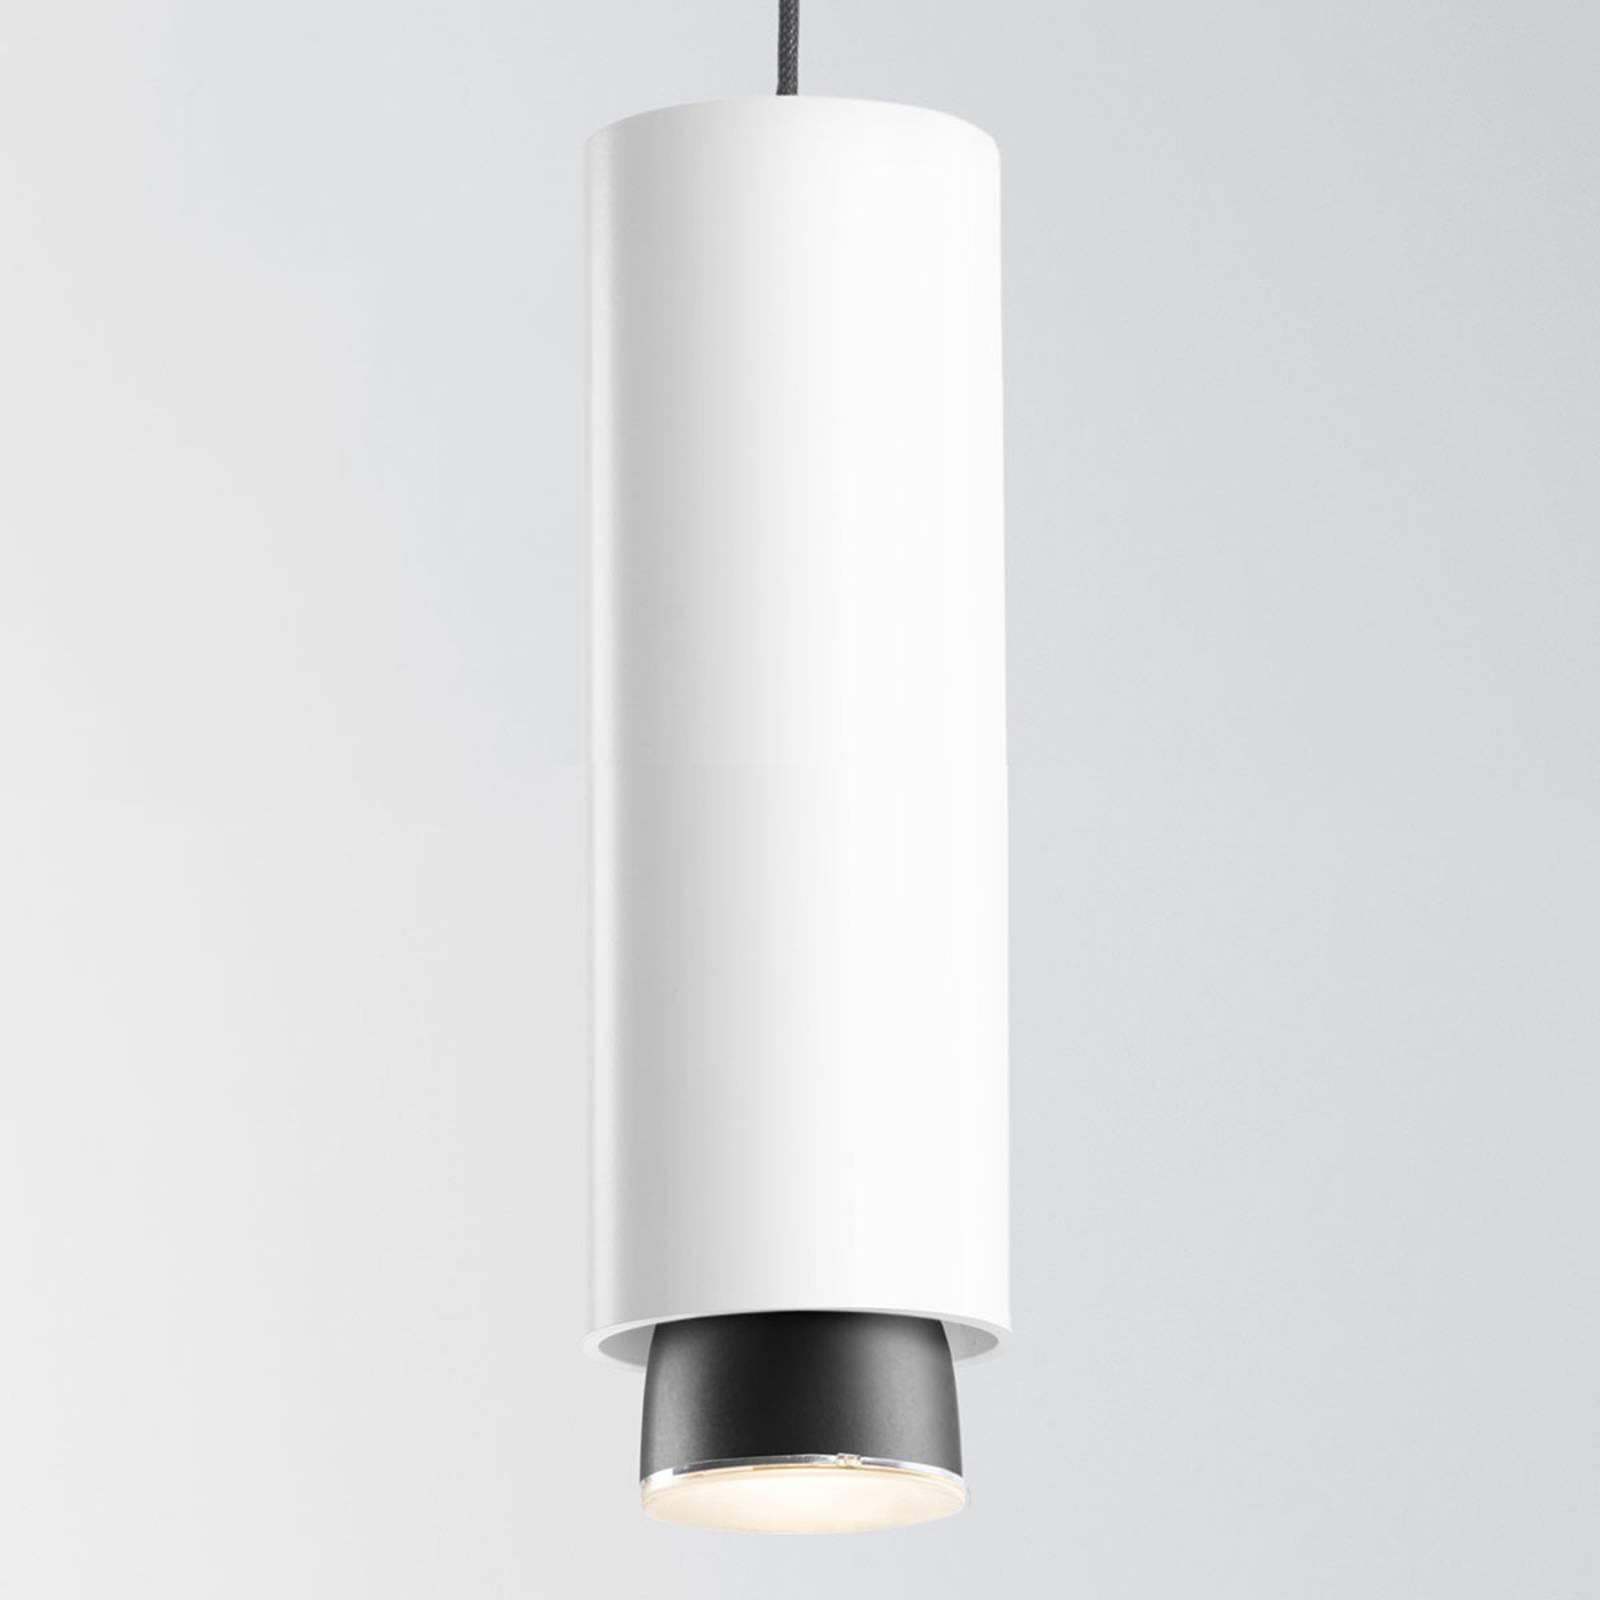 Fabbian Claque lampa wisząca LED 30 cm biała